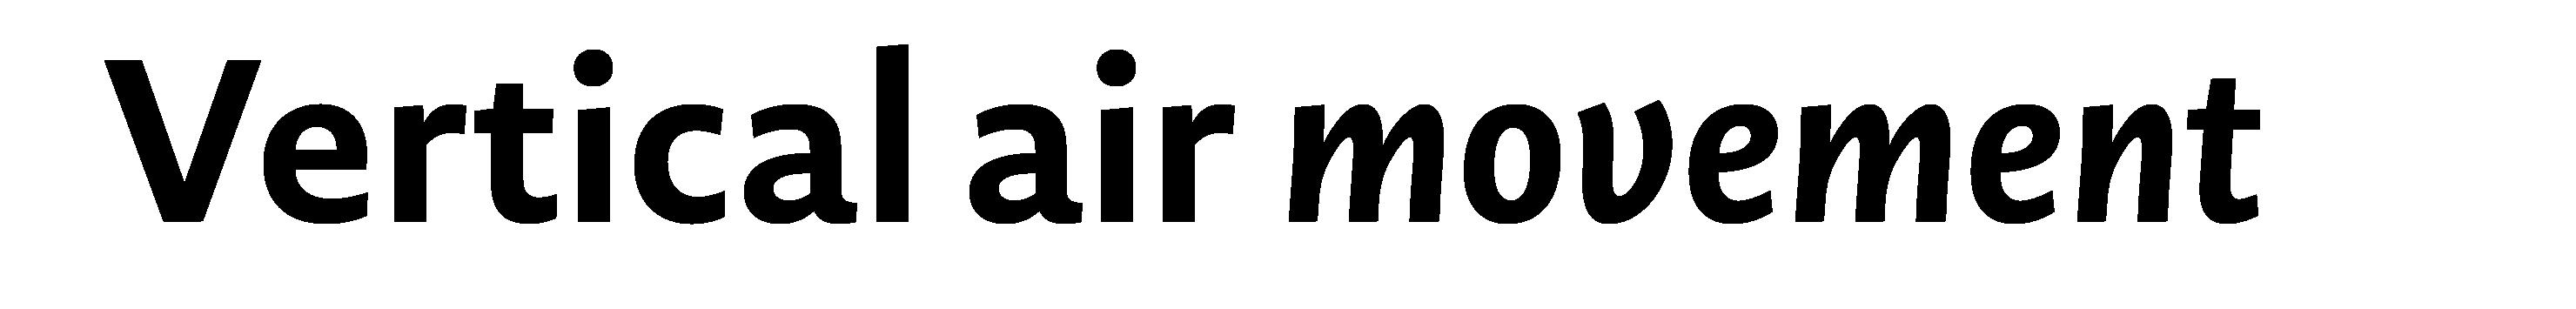 Typeface Novel Sans D05 Atlas Font Foundry